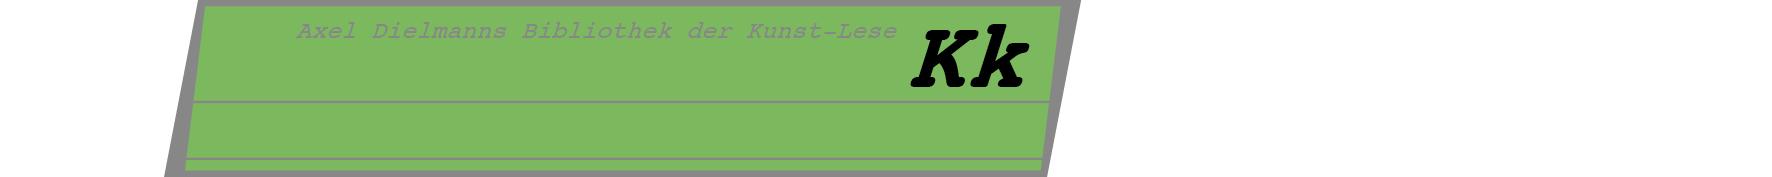 Kartei-K